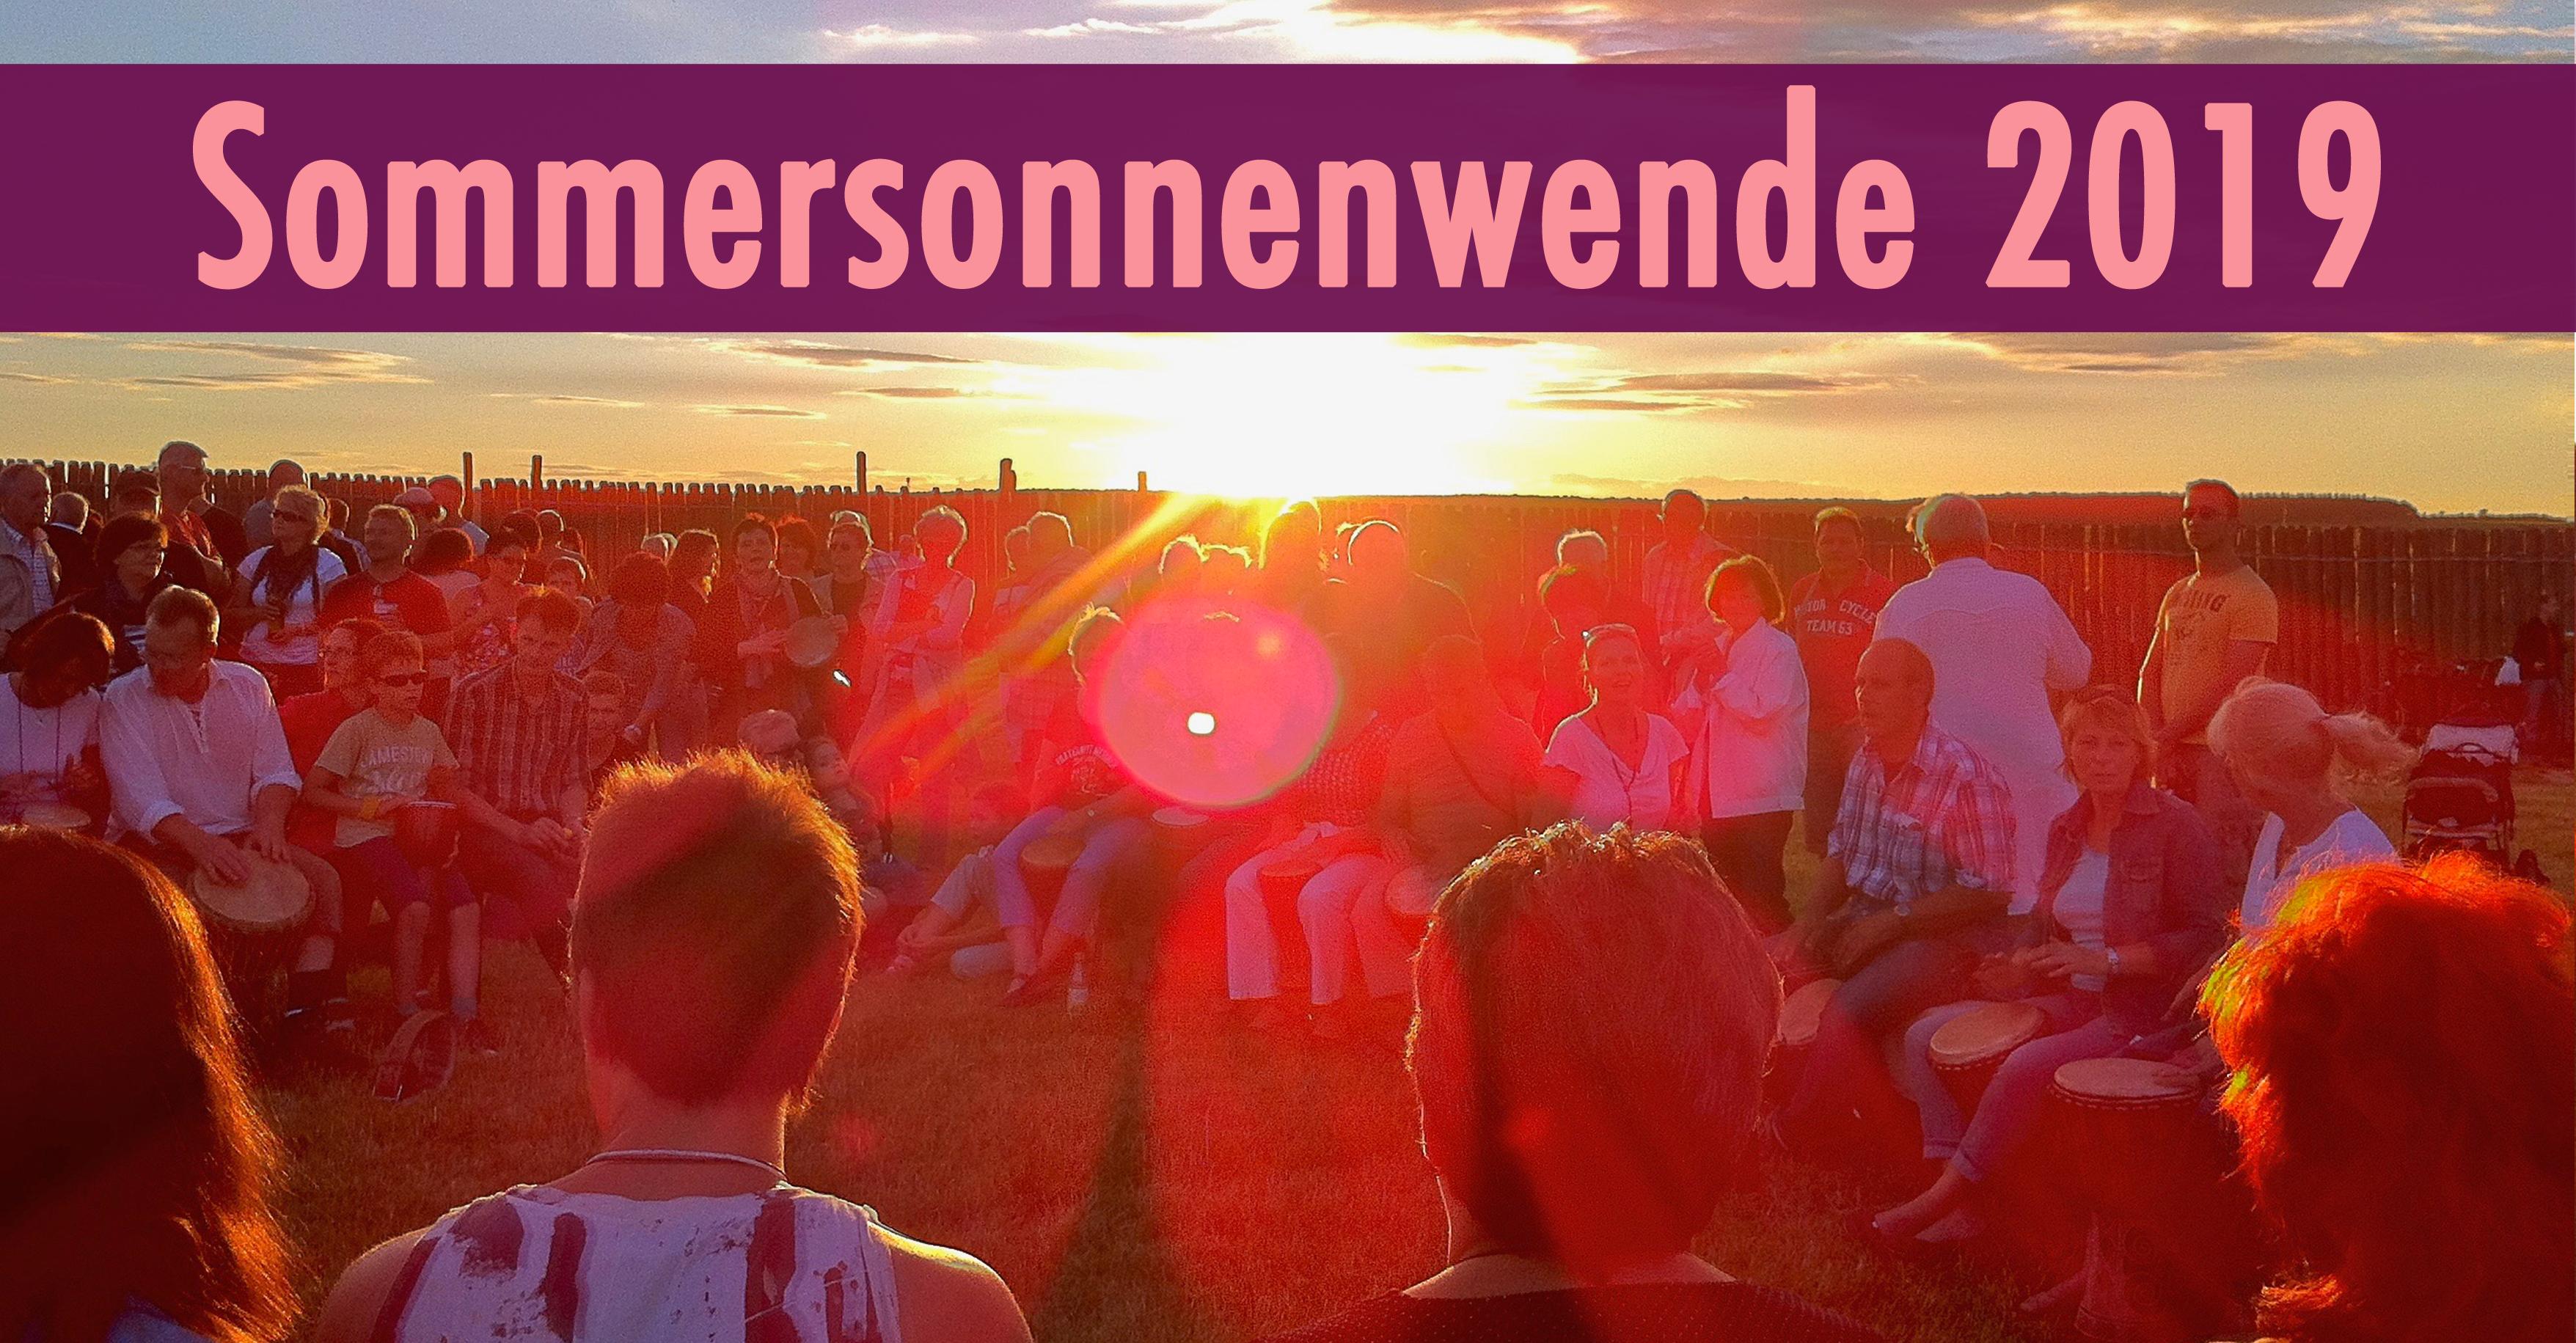 Sommersonnenwende Trommeln in der Trommelschule Yngo Gutmann 2019